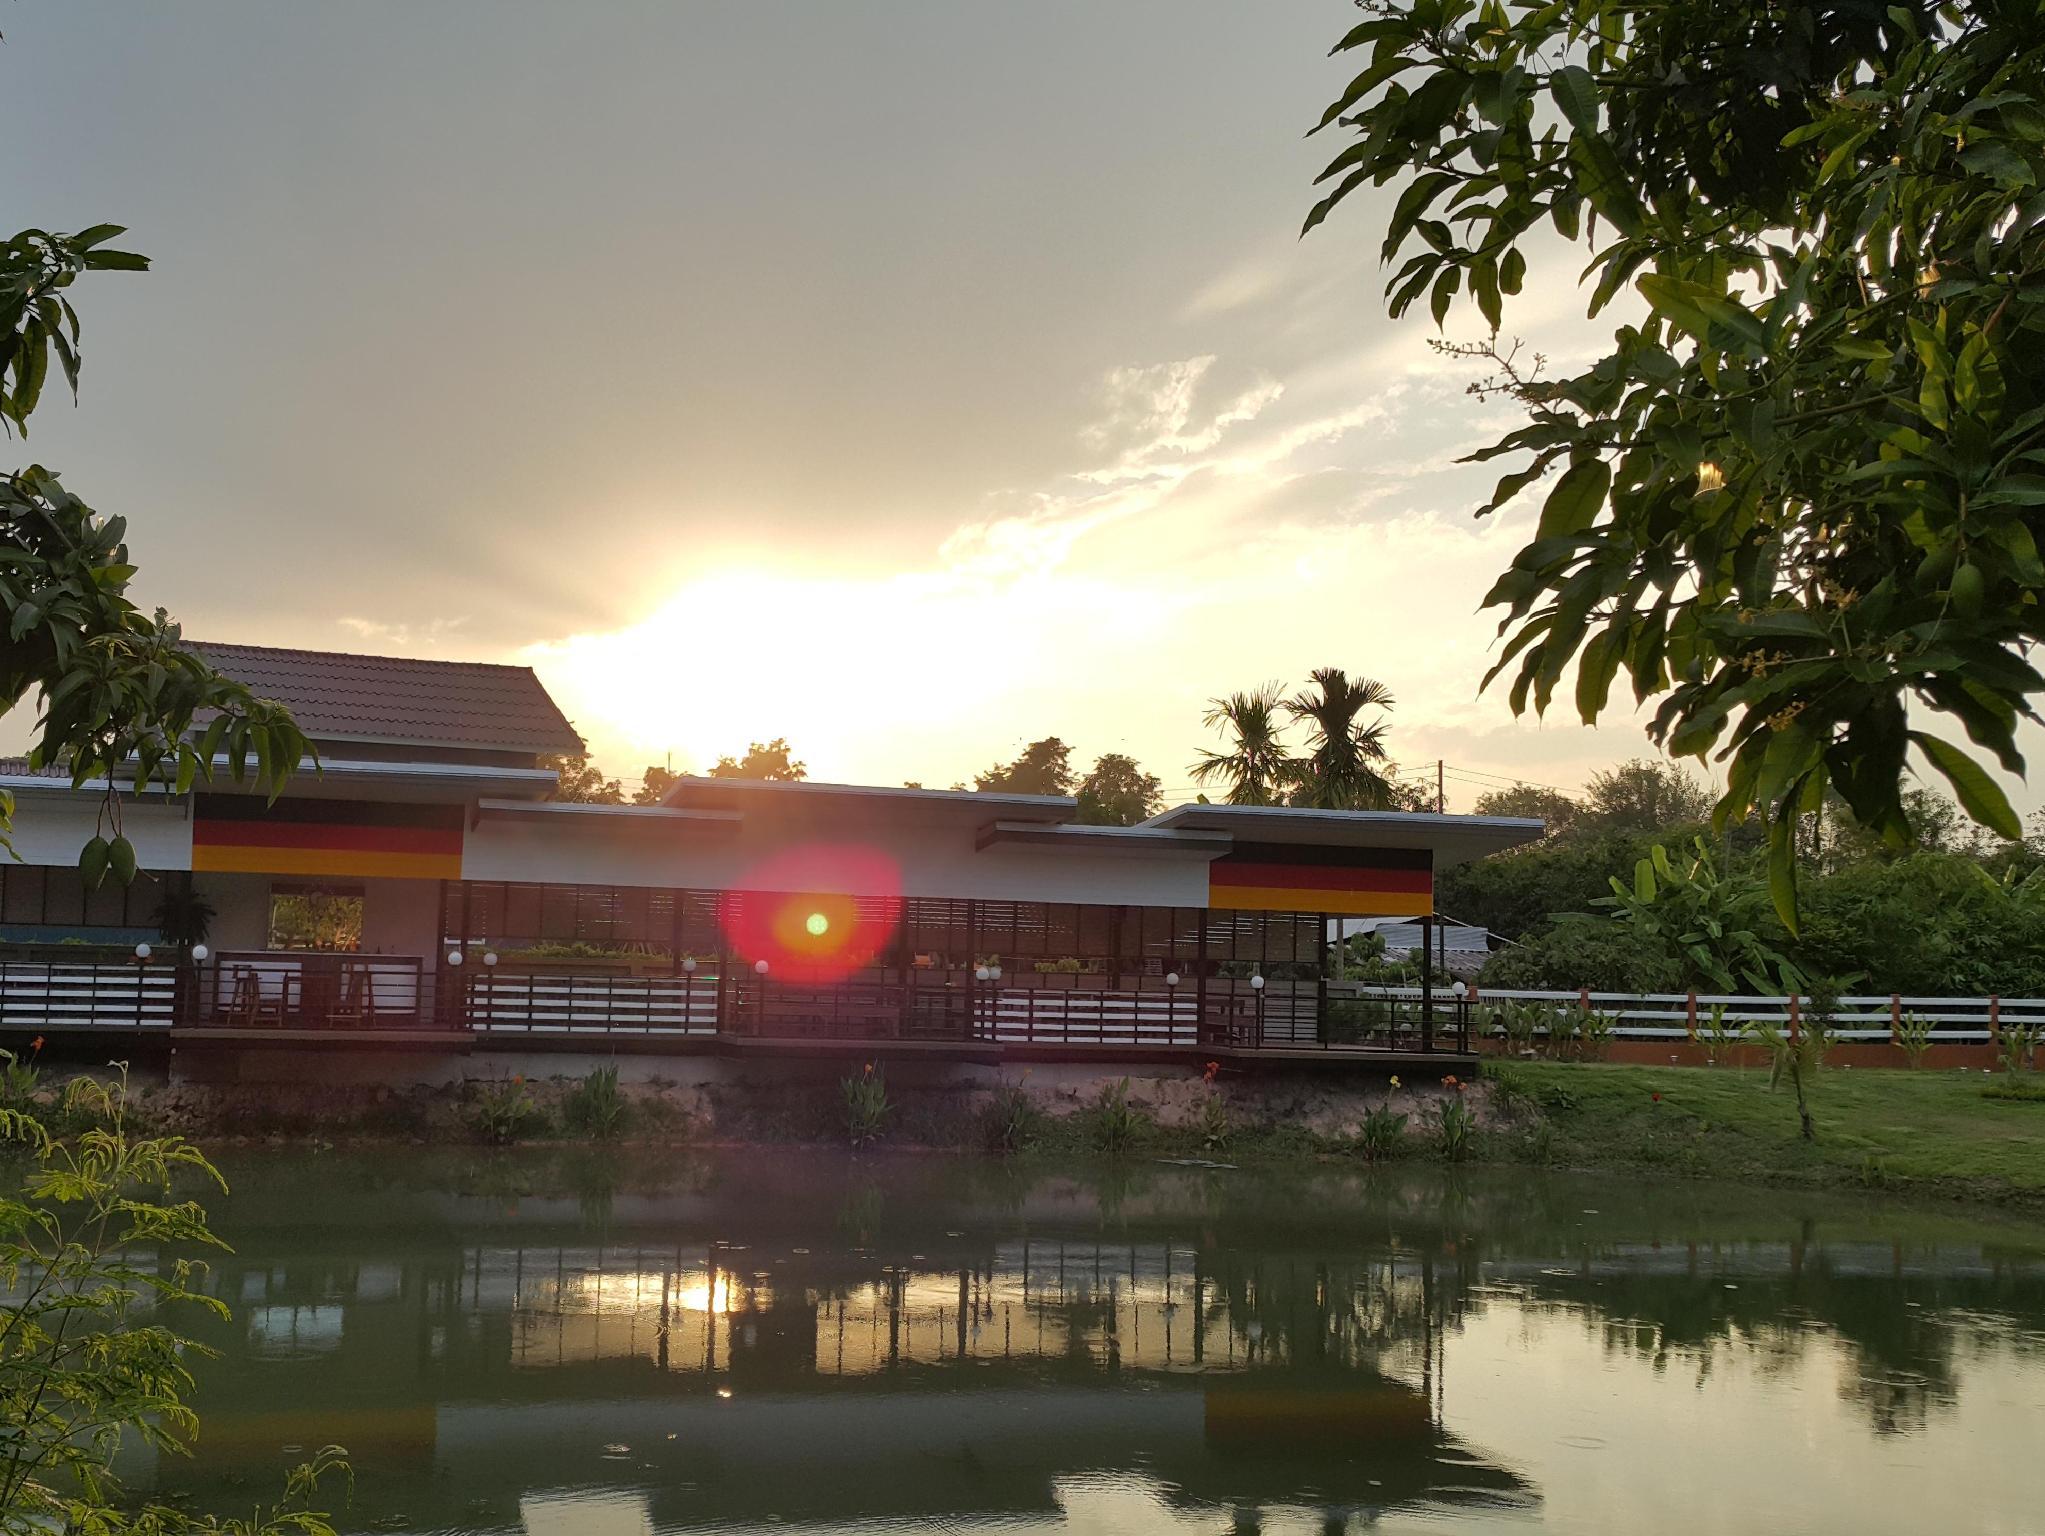 B3 Resort ChiangmaiB3 Resort,บี3 รีสอร์ต เชียงใหม่ บี3 รีสอร์ต